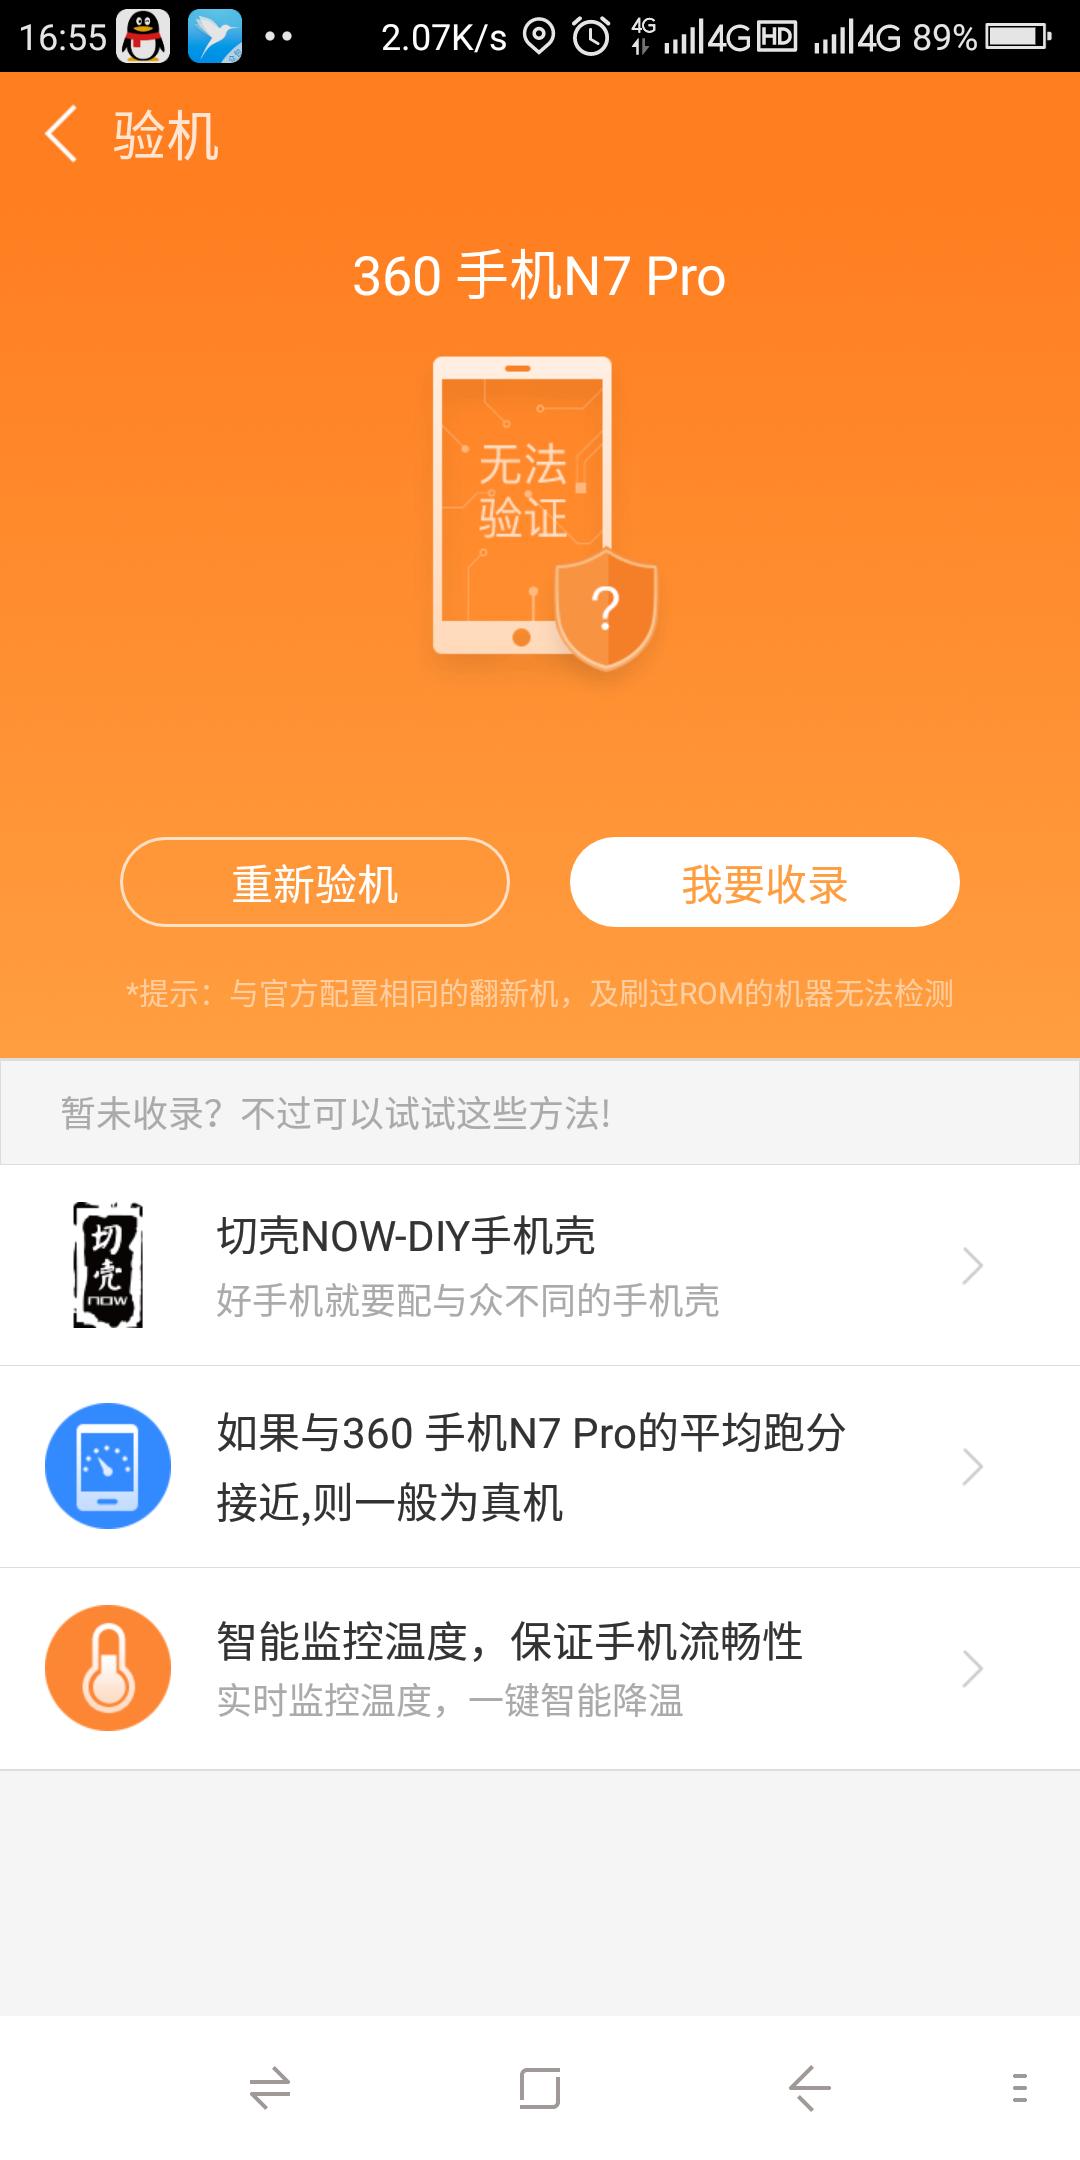 Screenshot_2018-12-30-16-55-04.png